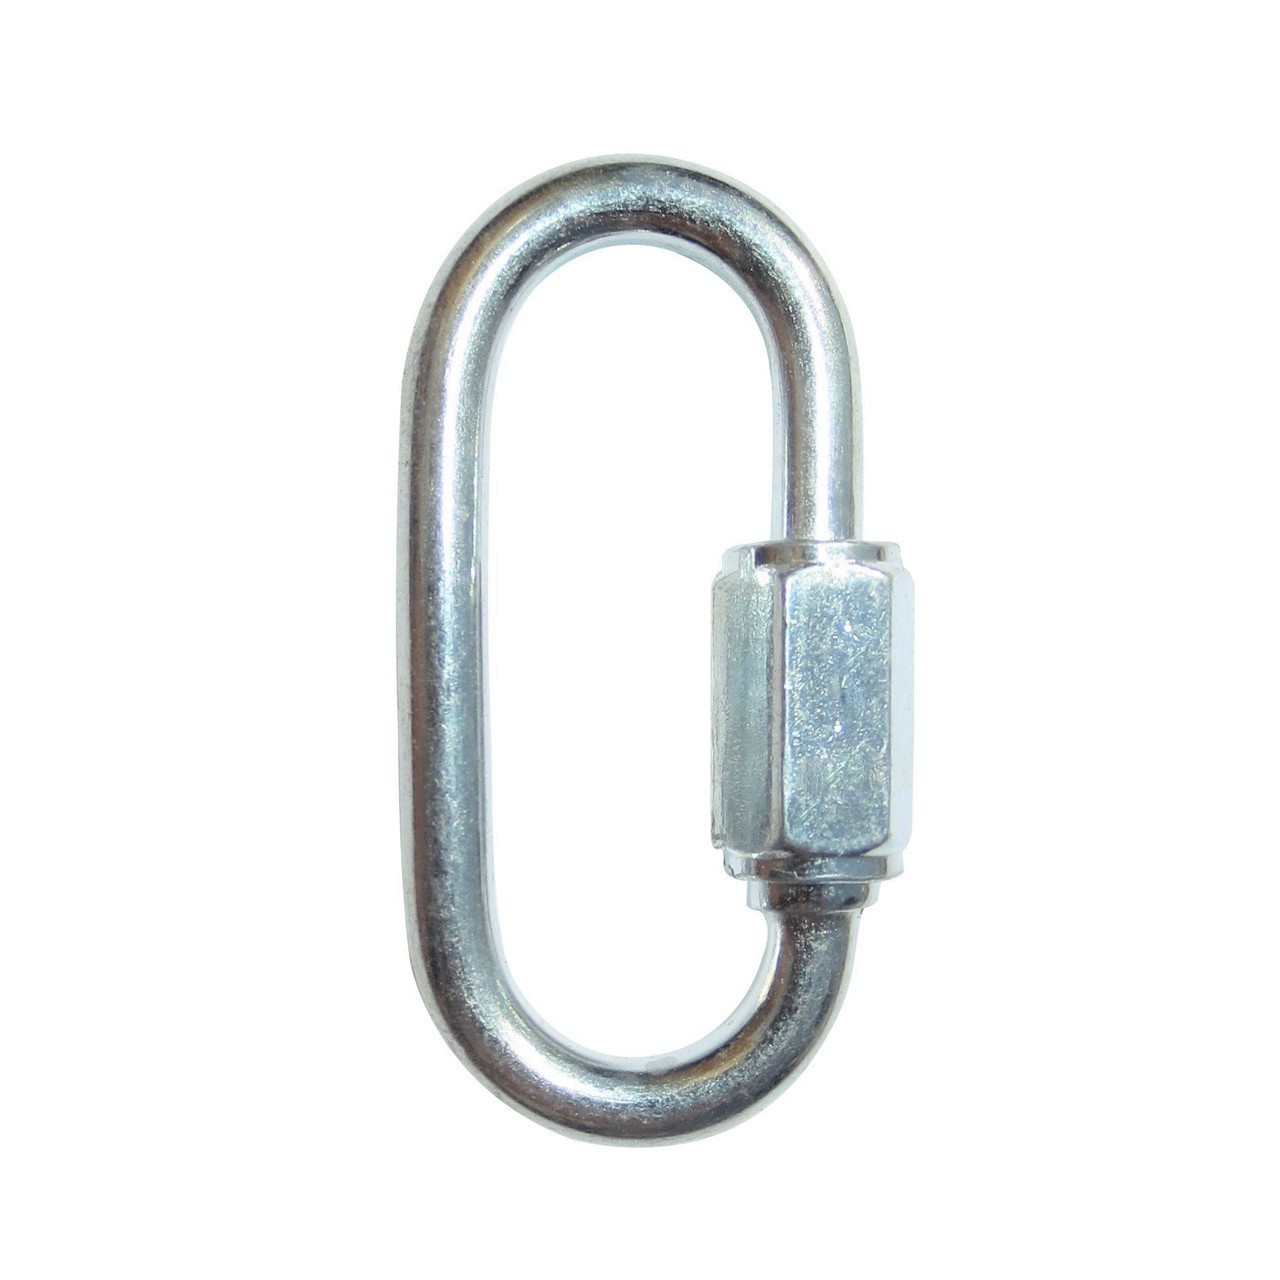 Quick Links - 5.0mm - Zinc Plated